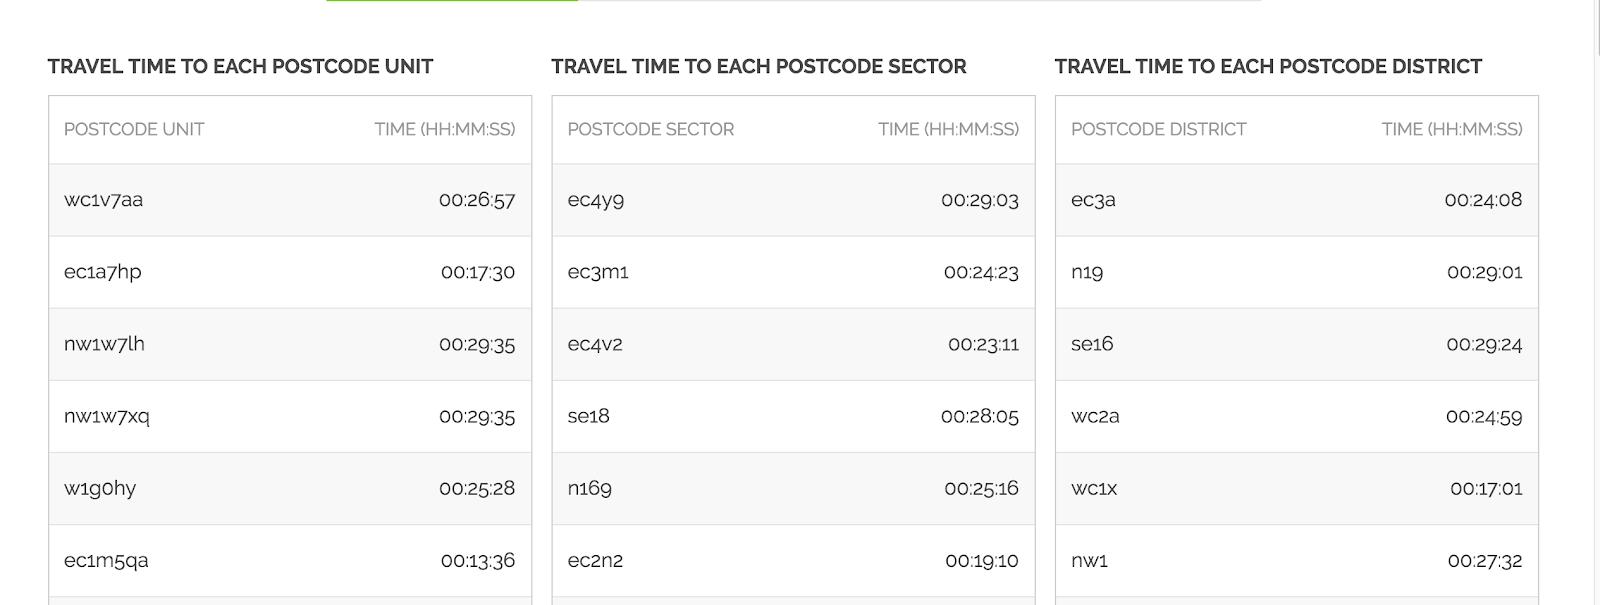 business-location-analysis-postcode